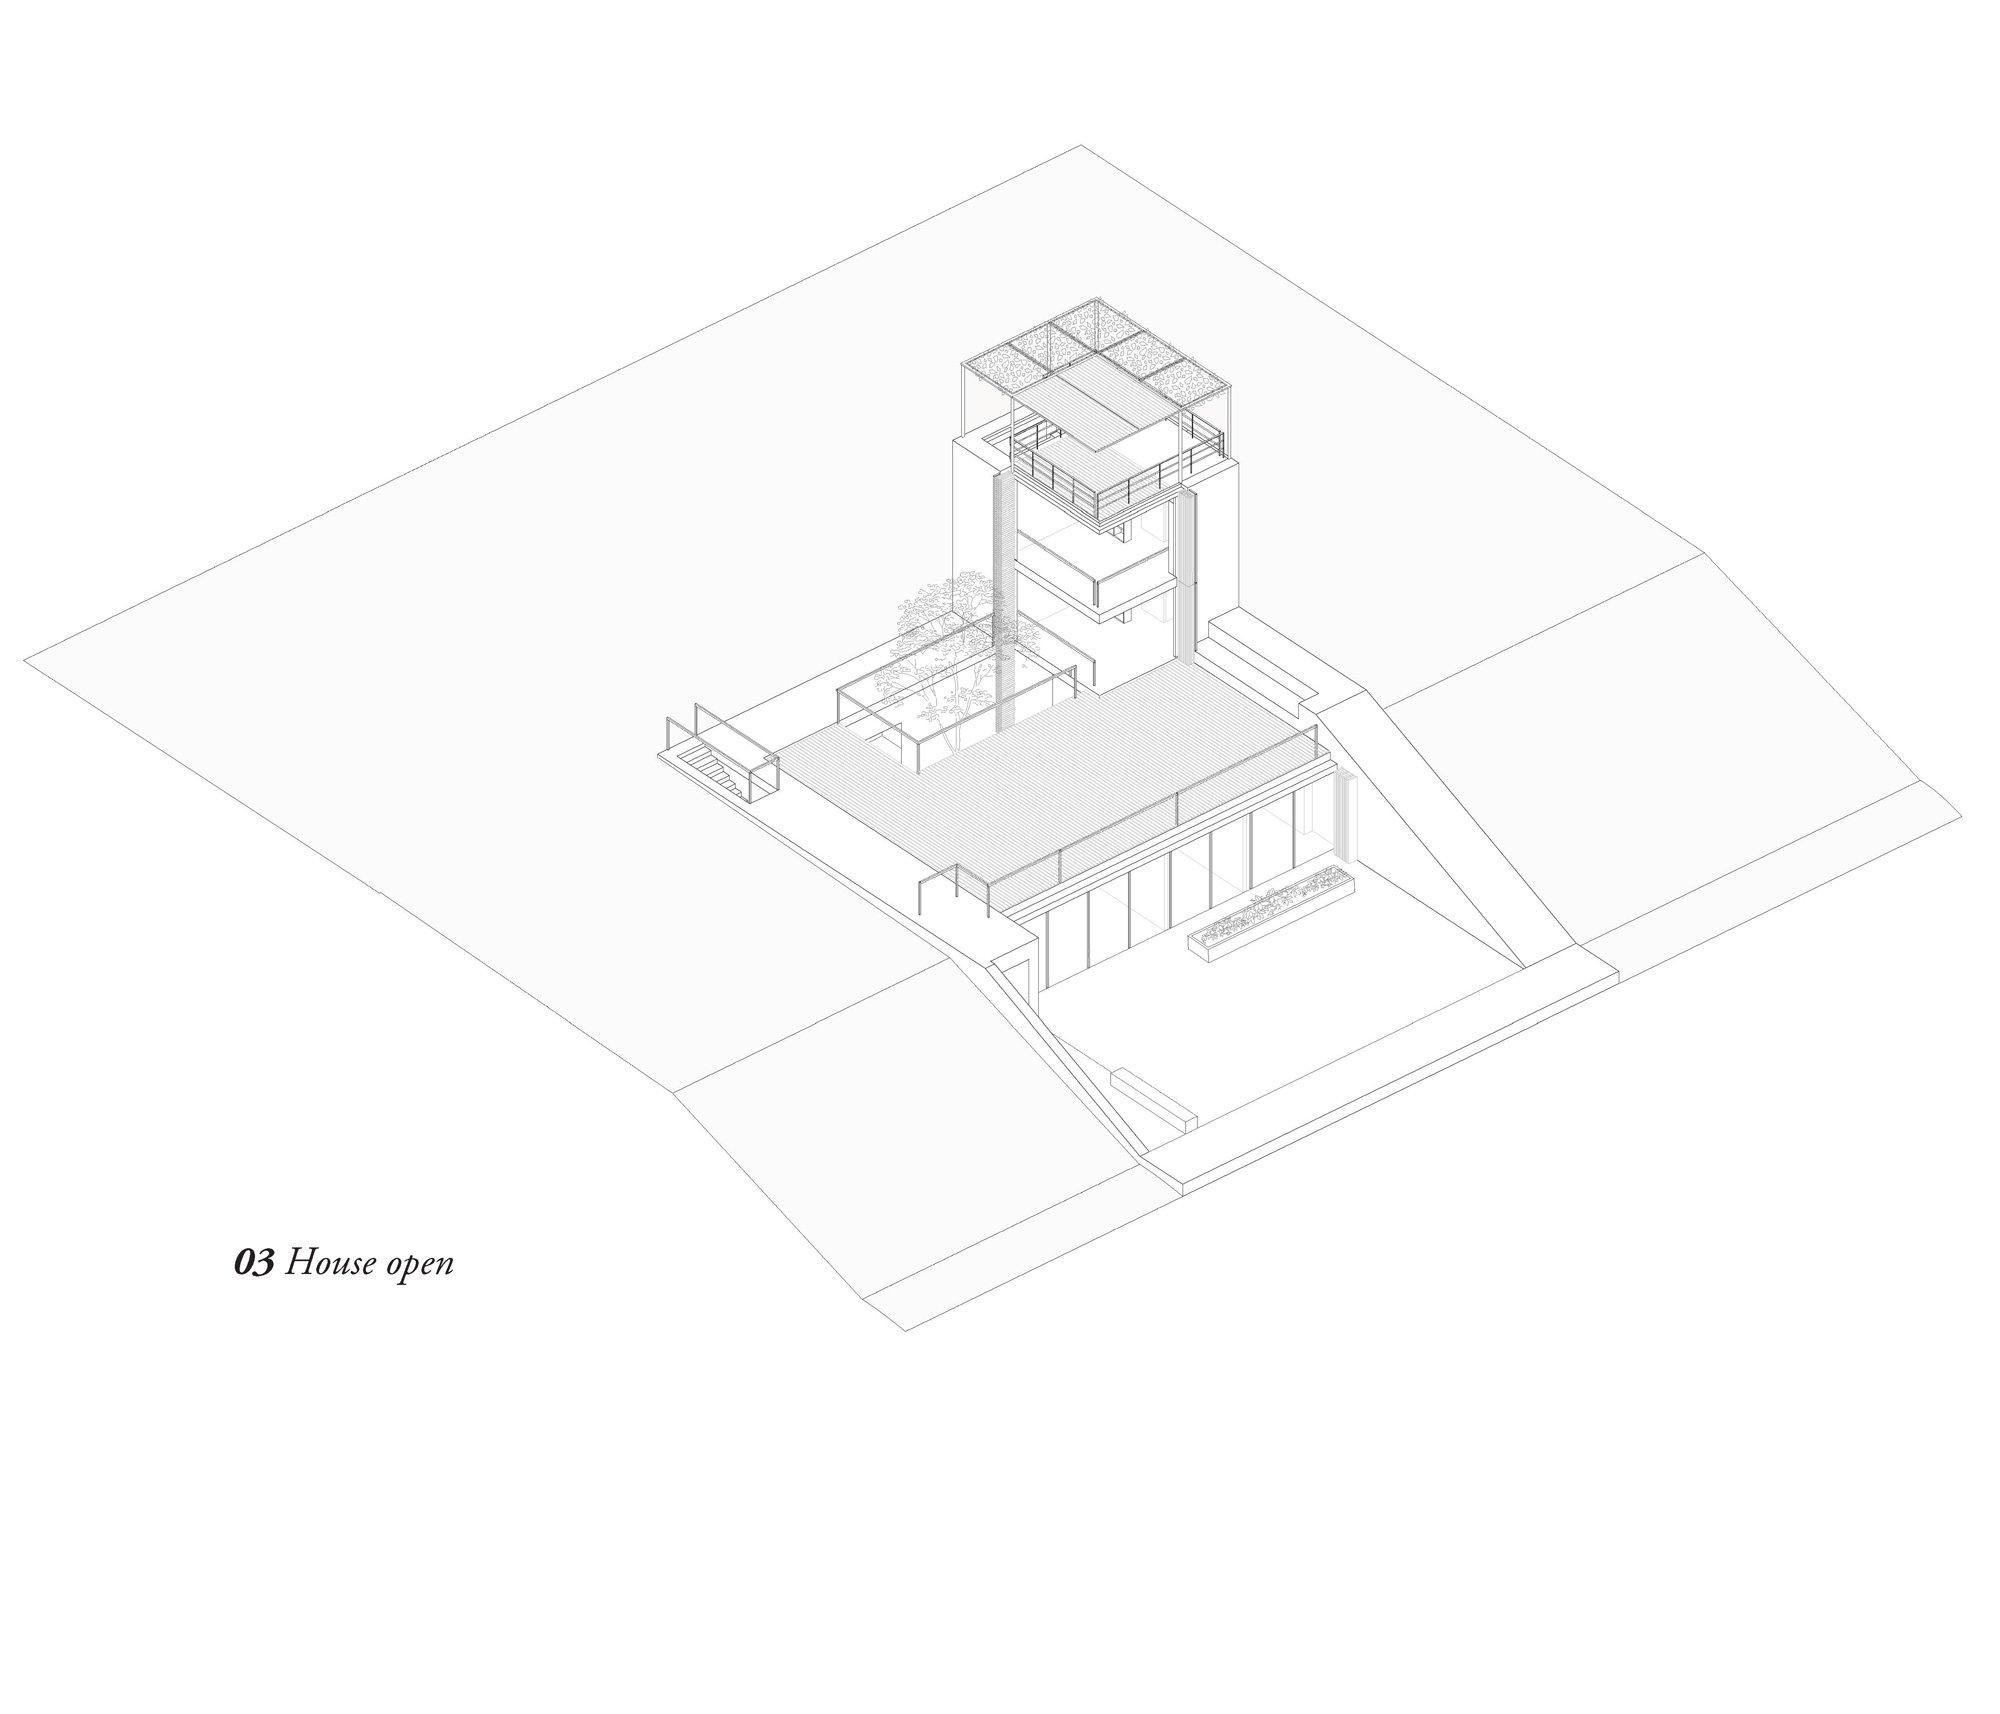 Vista assonometrica casa aperta © Hashim Sarkis Studios